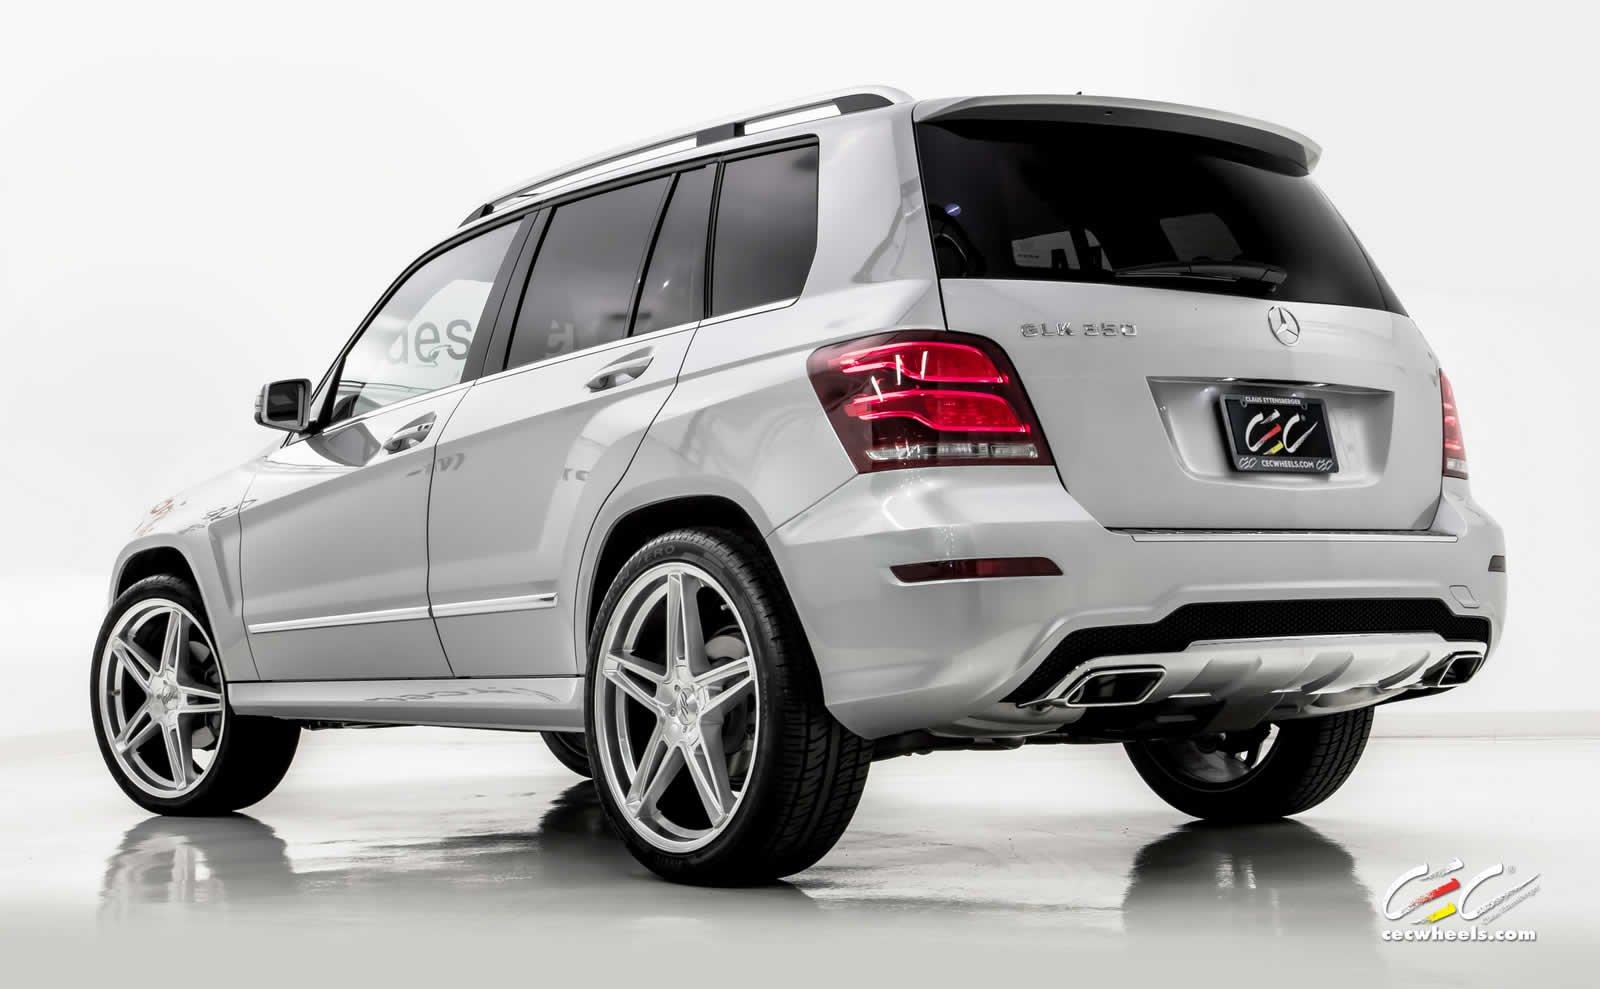 2015 cec wheels tuning cars mercedes benz glk 350. Black Bedroom Furniture Sets. Home Design Ideas